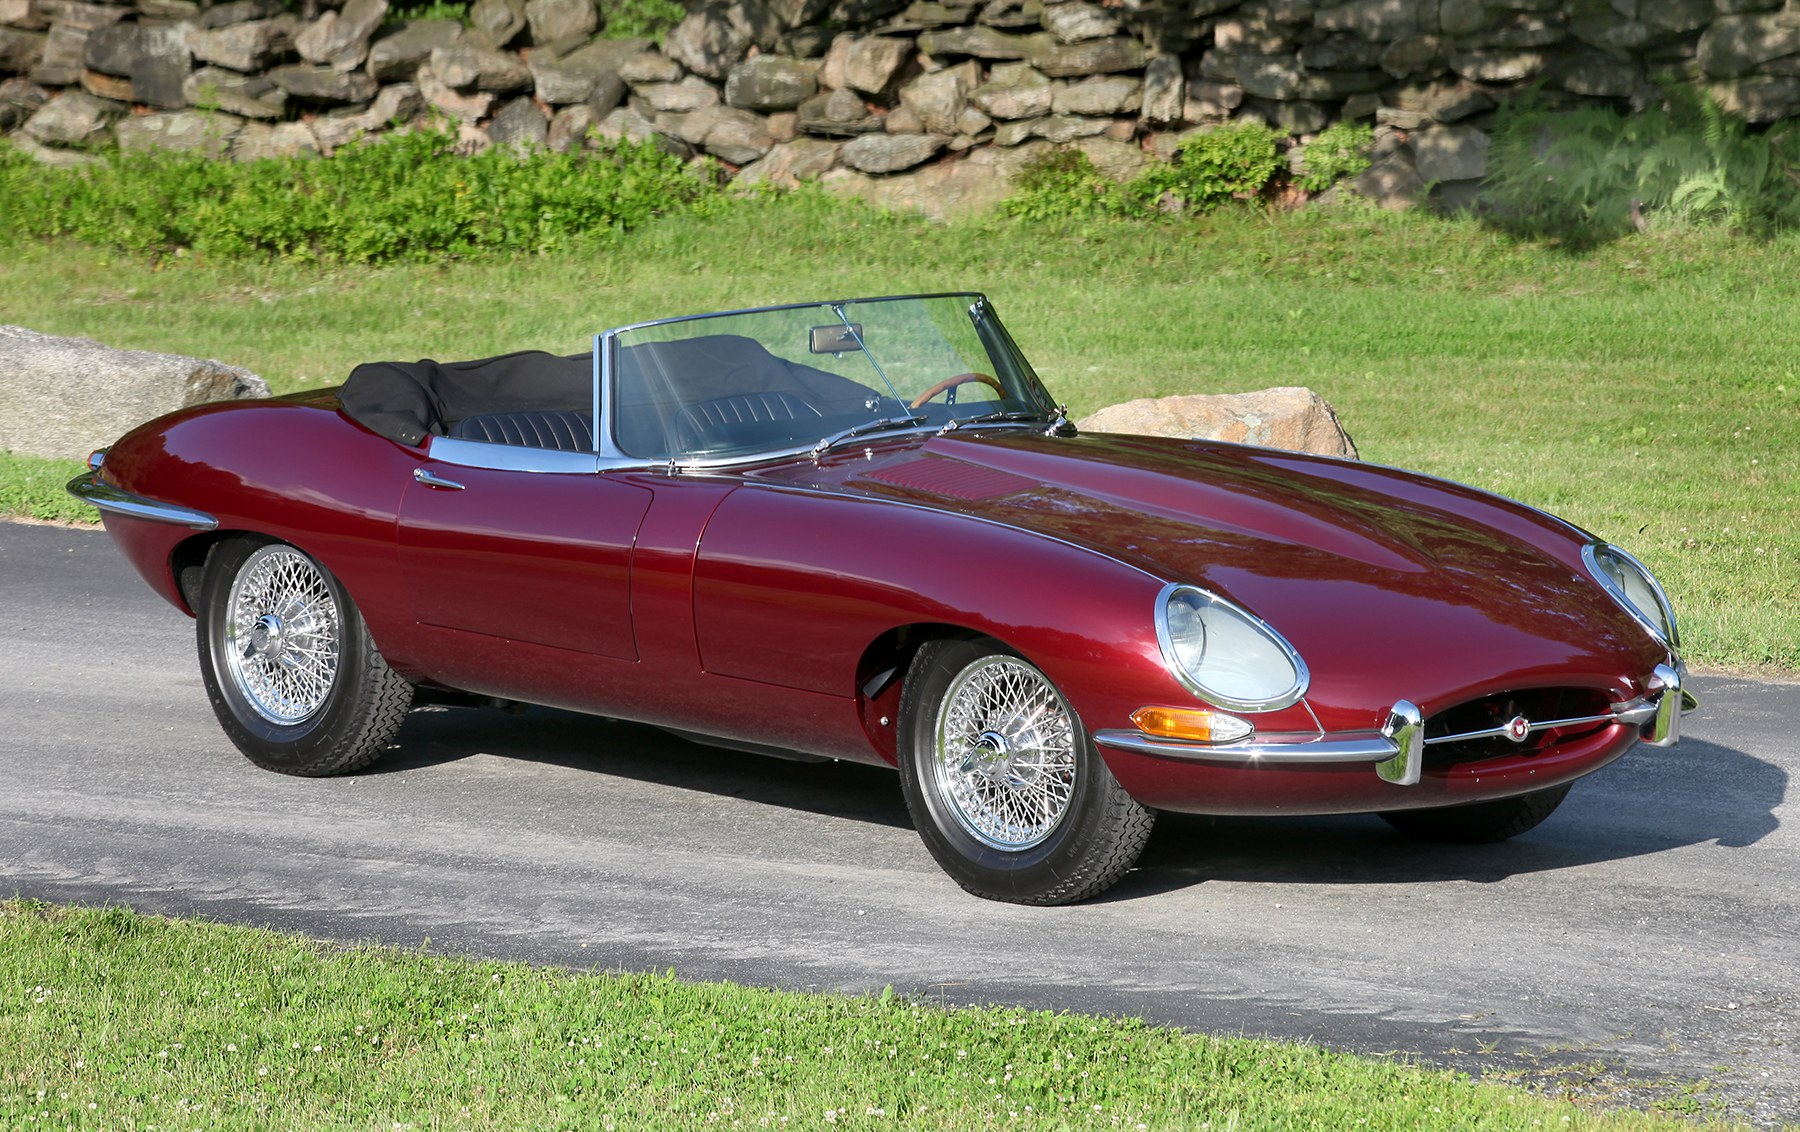 1967 Jaguar E-Type Series 1 4.2-Litre Roadster